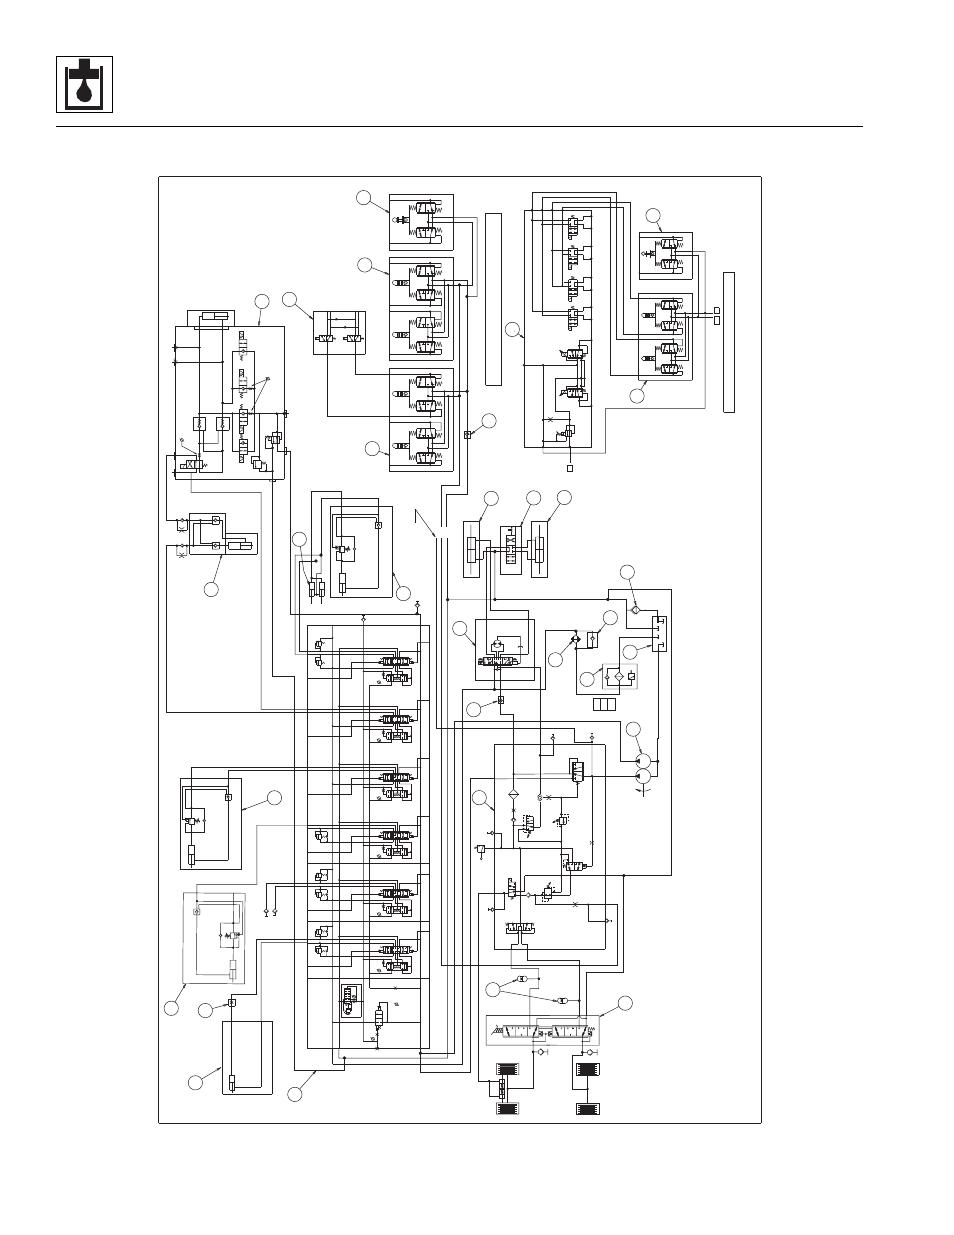 medium resolution of 2 hydraulic schematic 944e hydraulic schematic 944e hydraulic system mu7430b